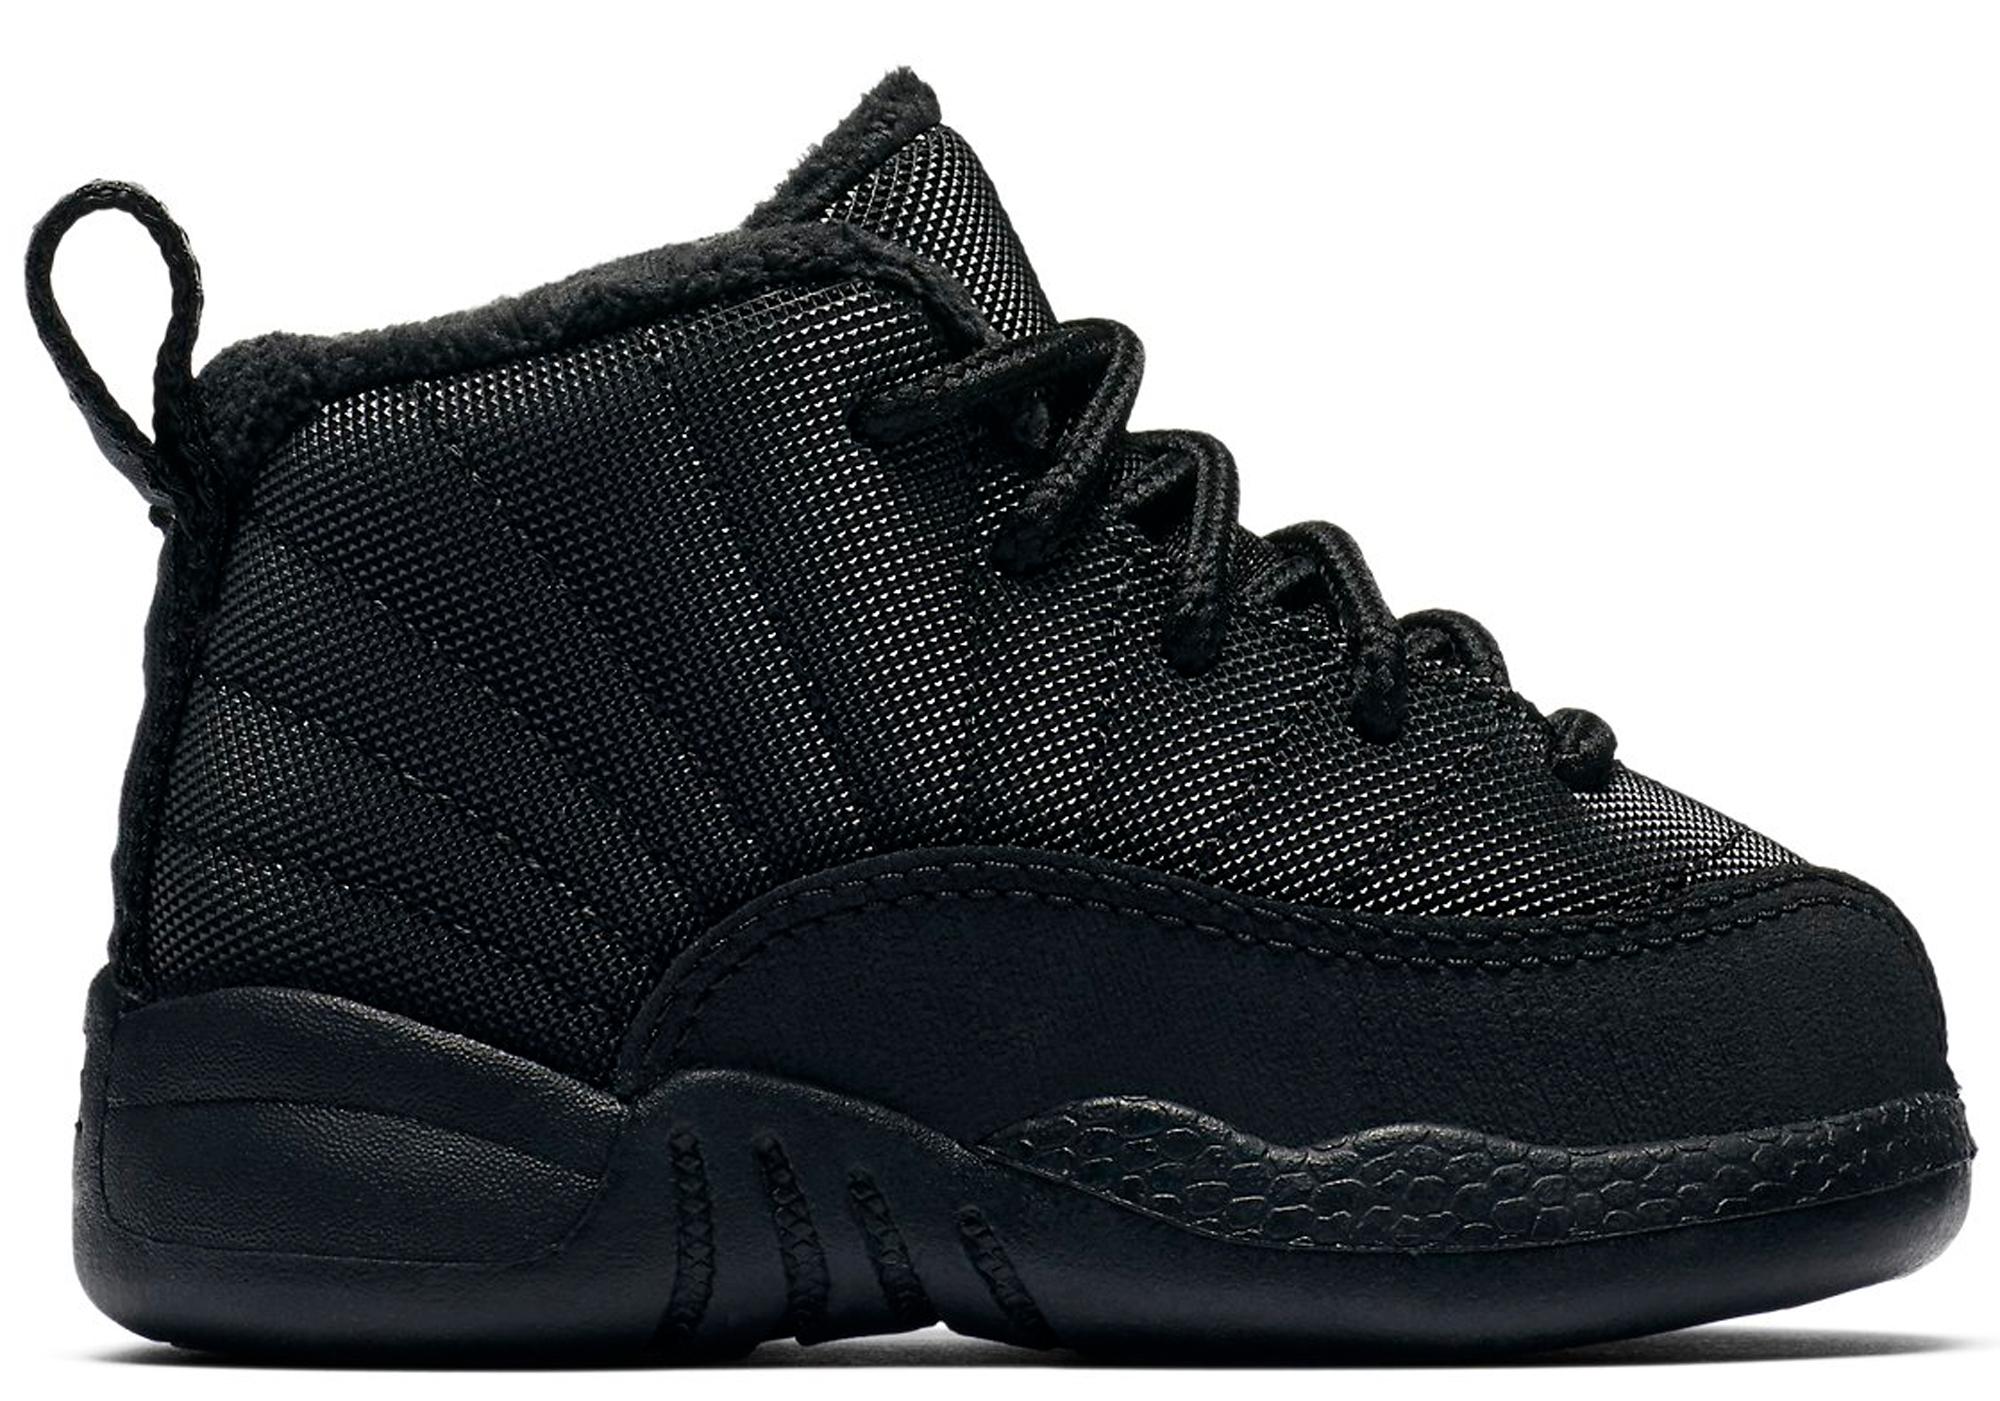 Jordan 12 Retro Winter Black (TD)